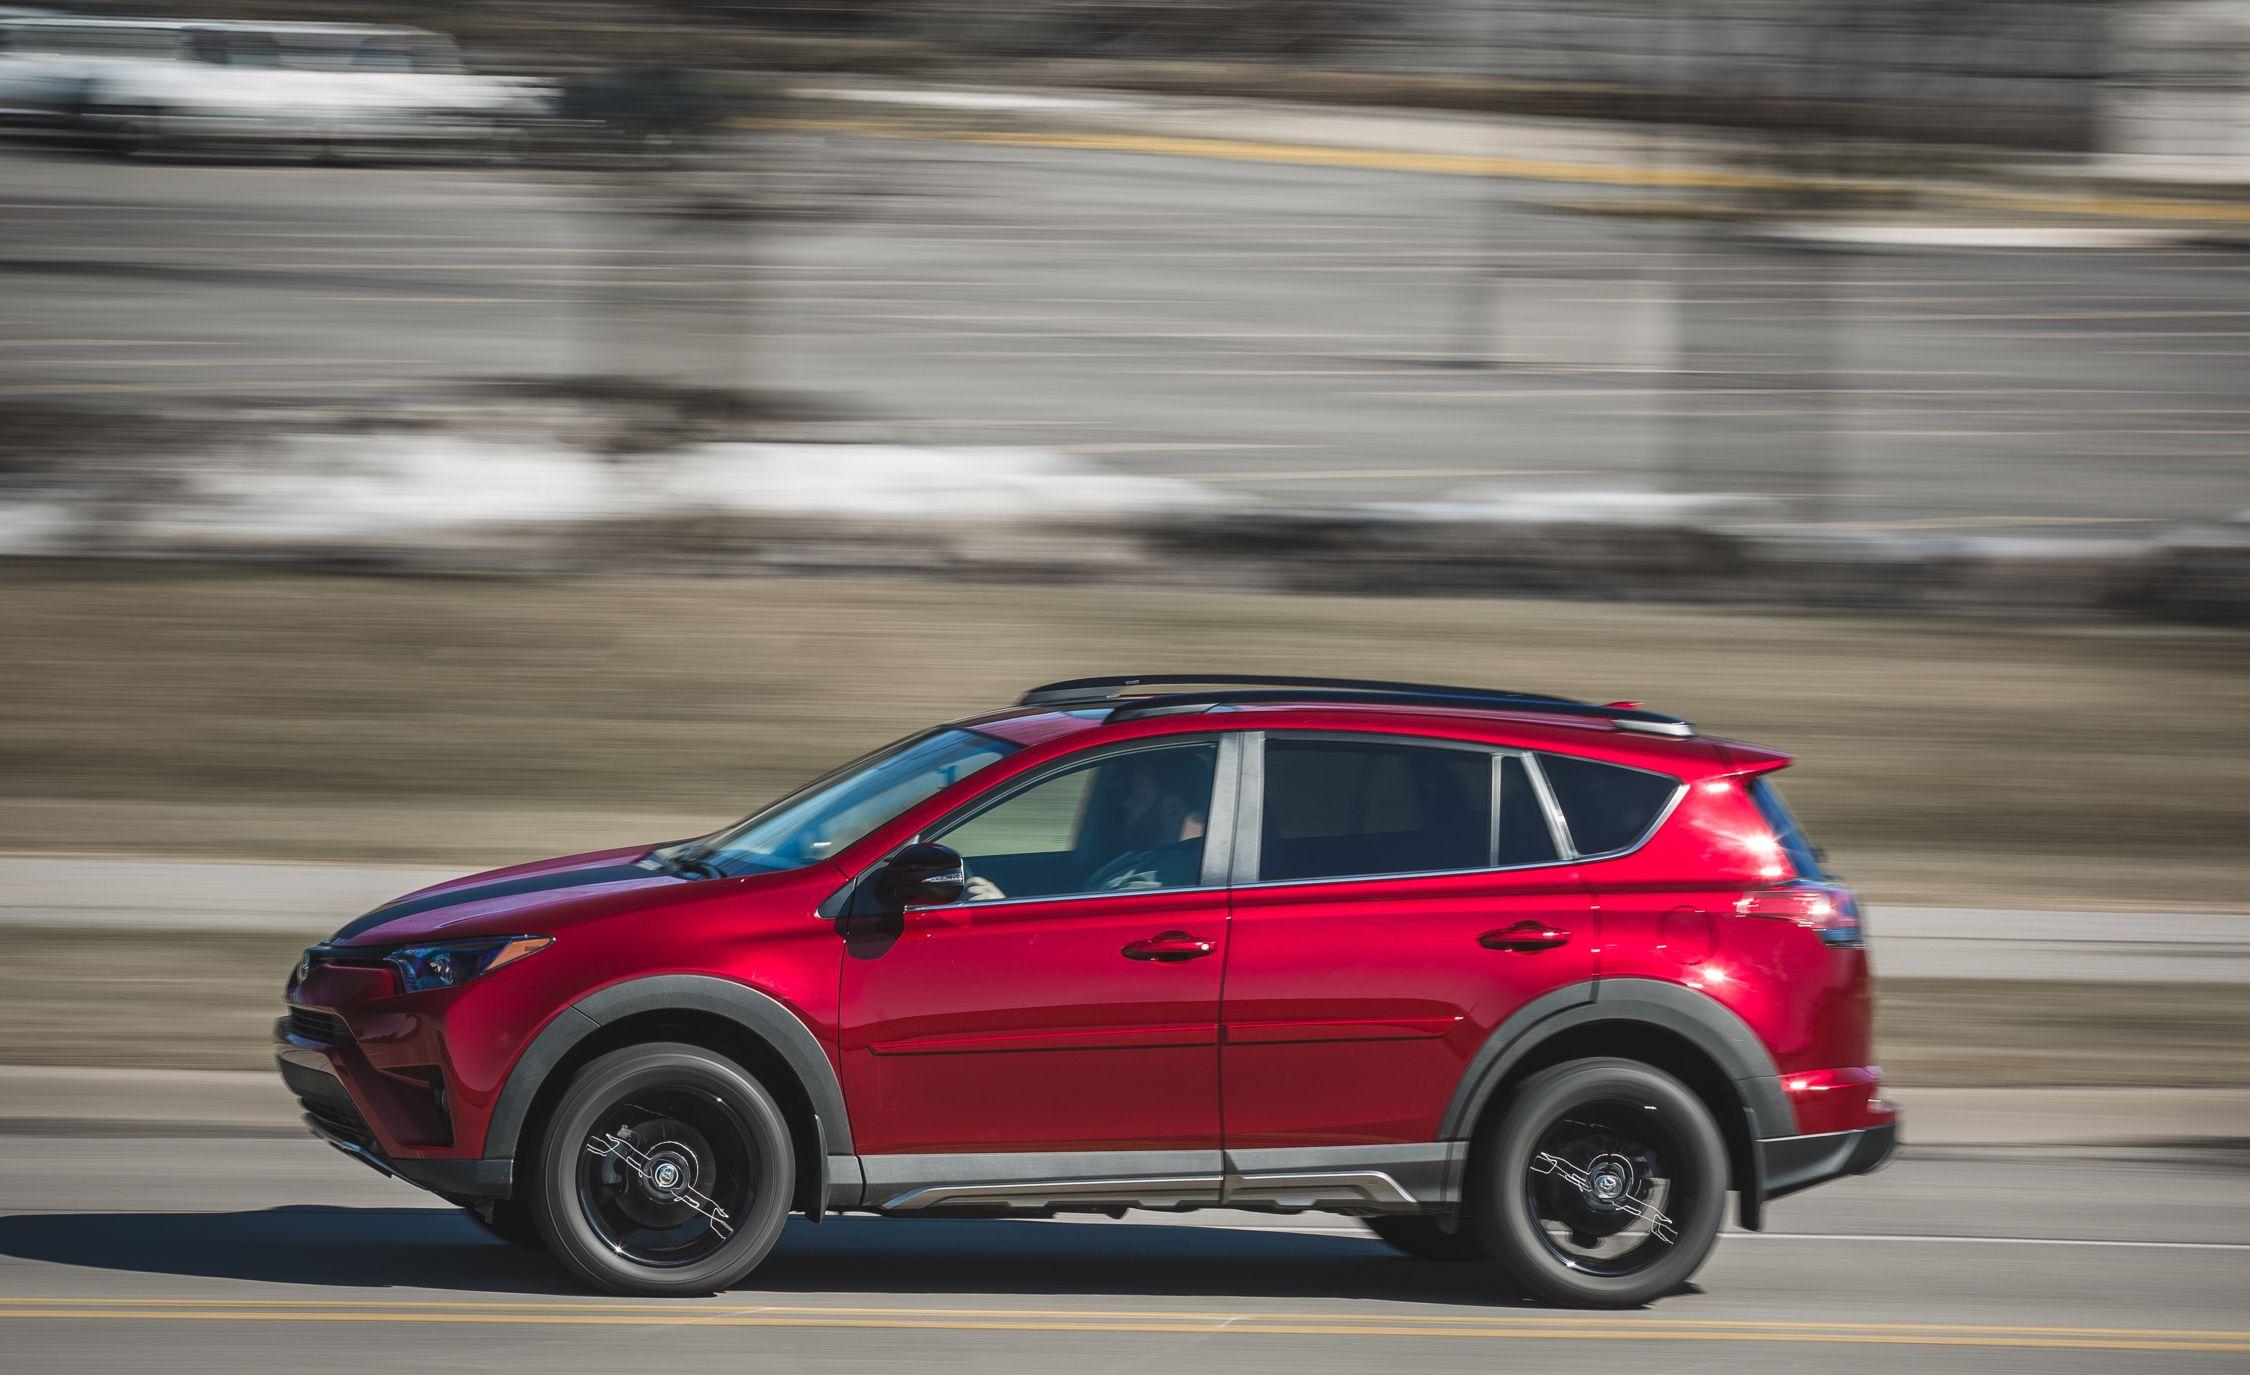 Toyota RAV4 Reviews | Toyota RAV4 Price, Photos, And Specs | Car And Driver